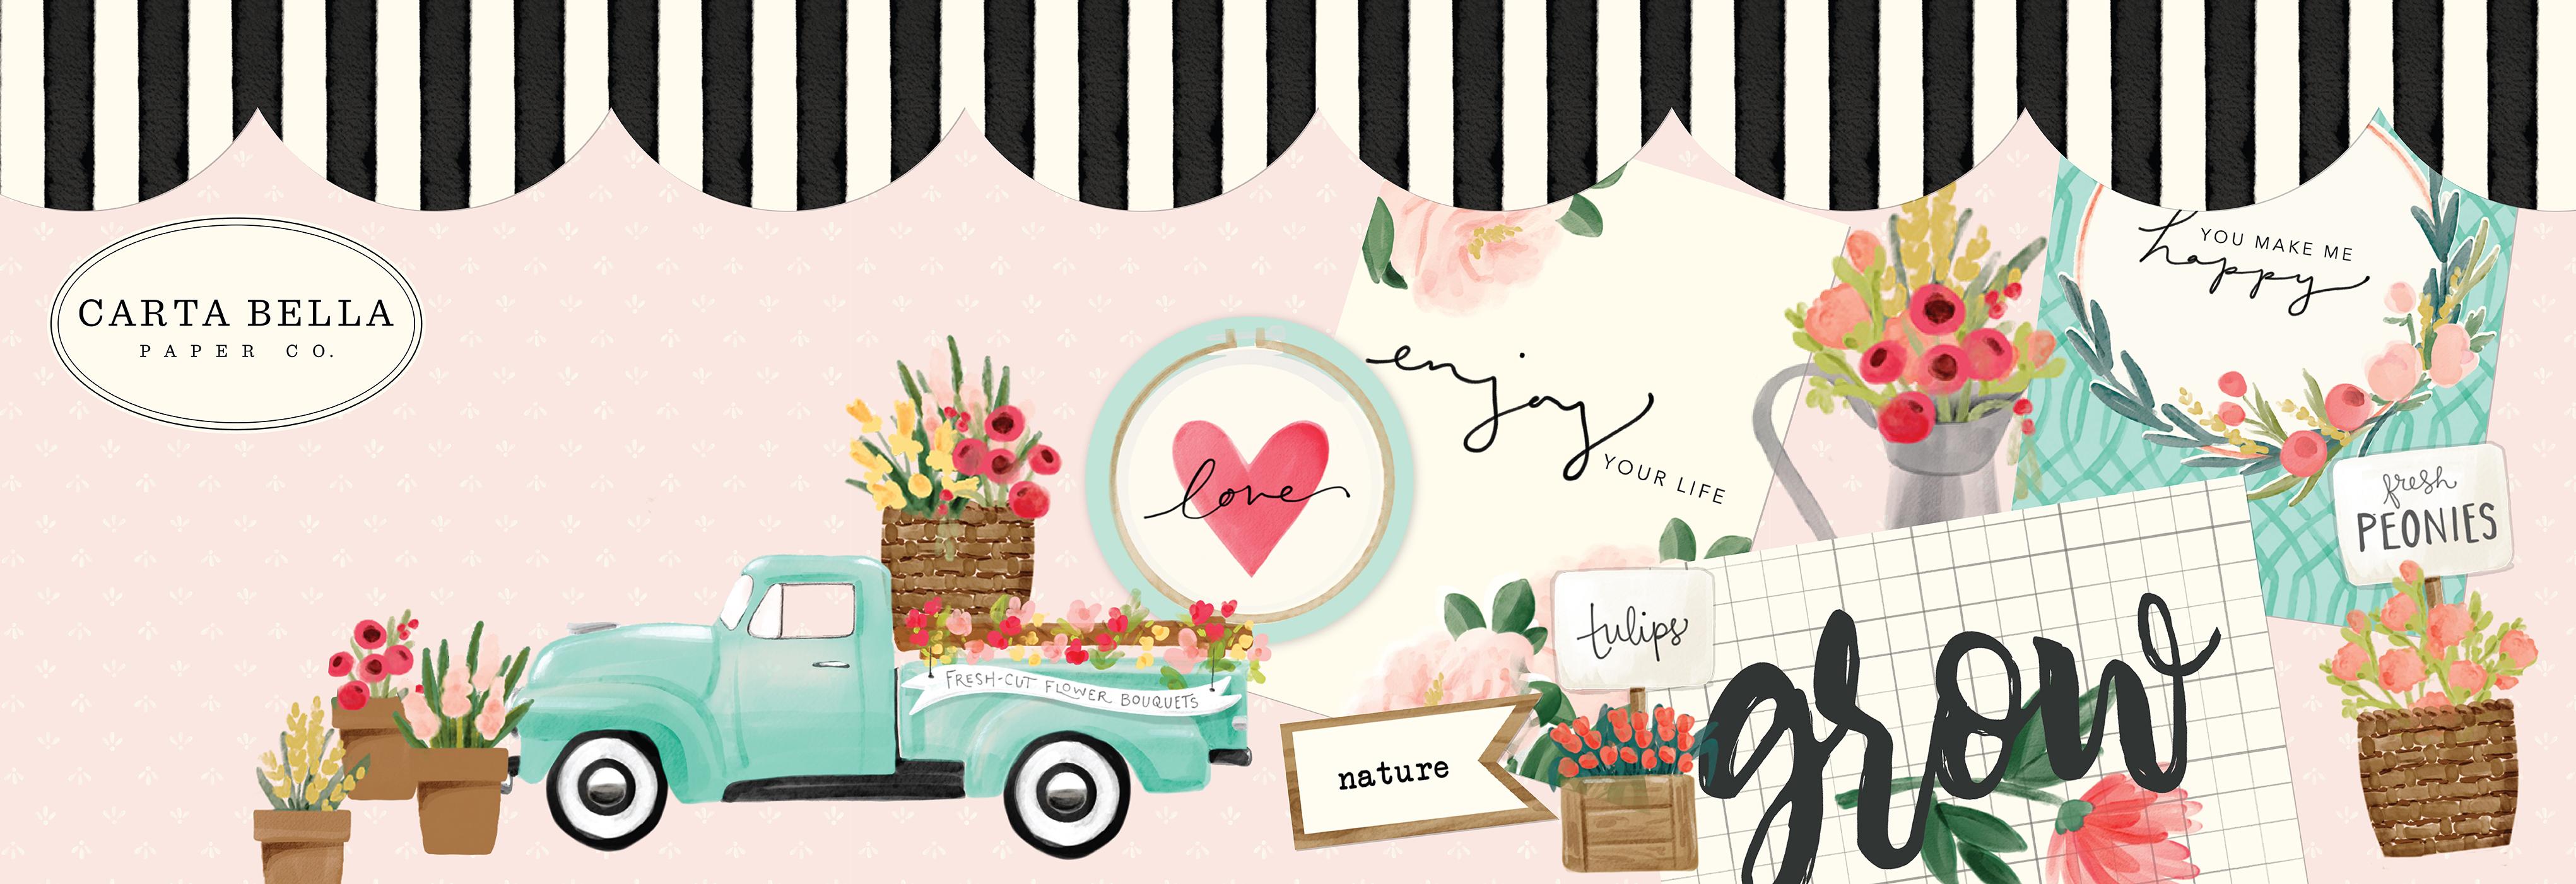 cb-flower-market-snap-click-banner-4083.jpg